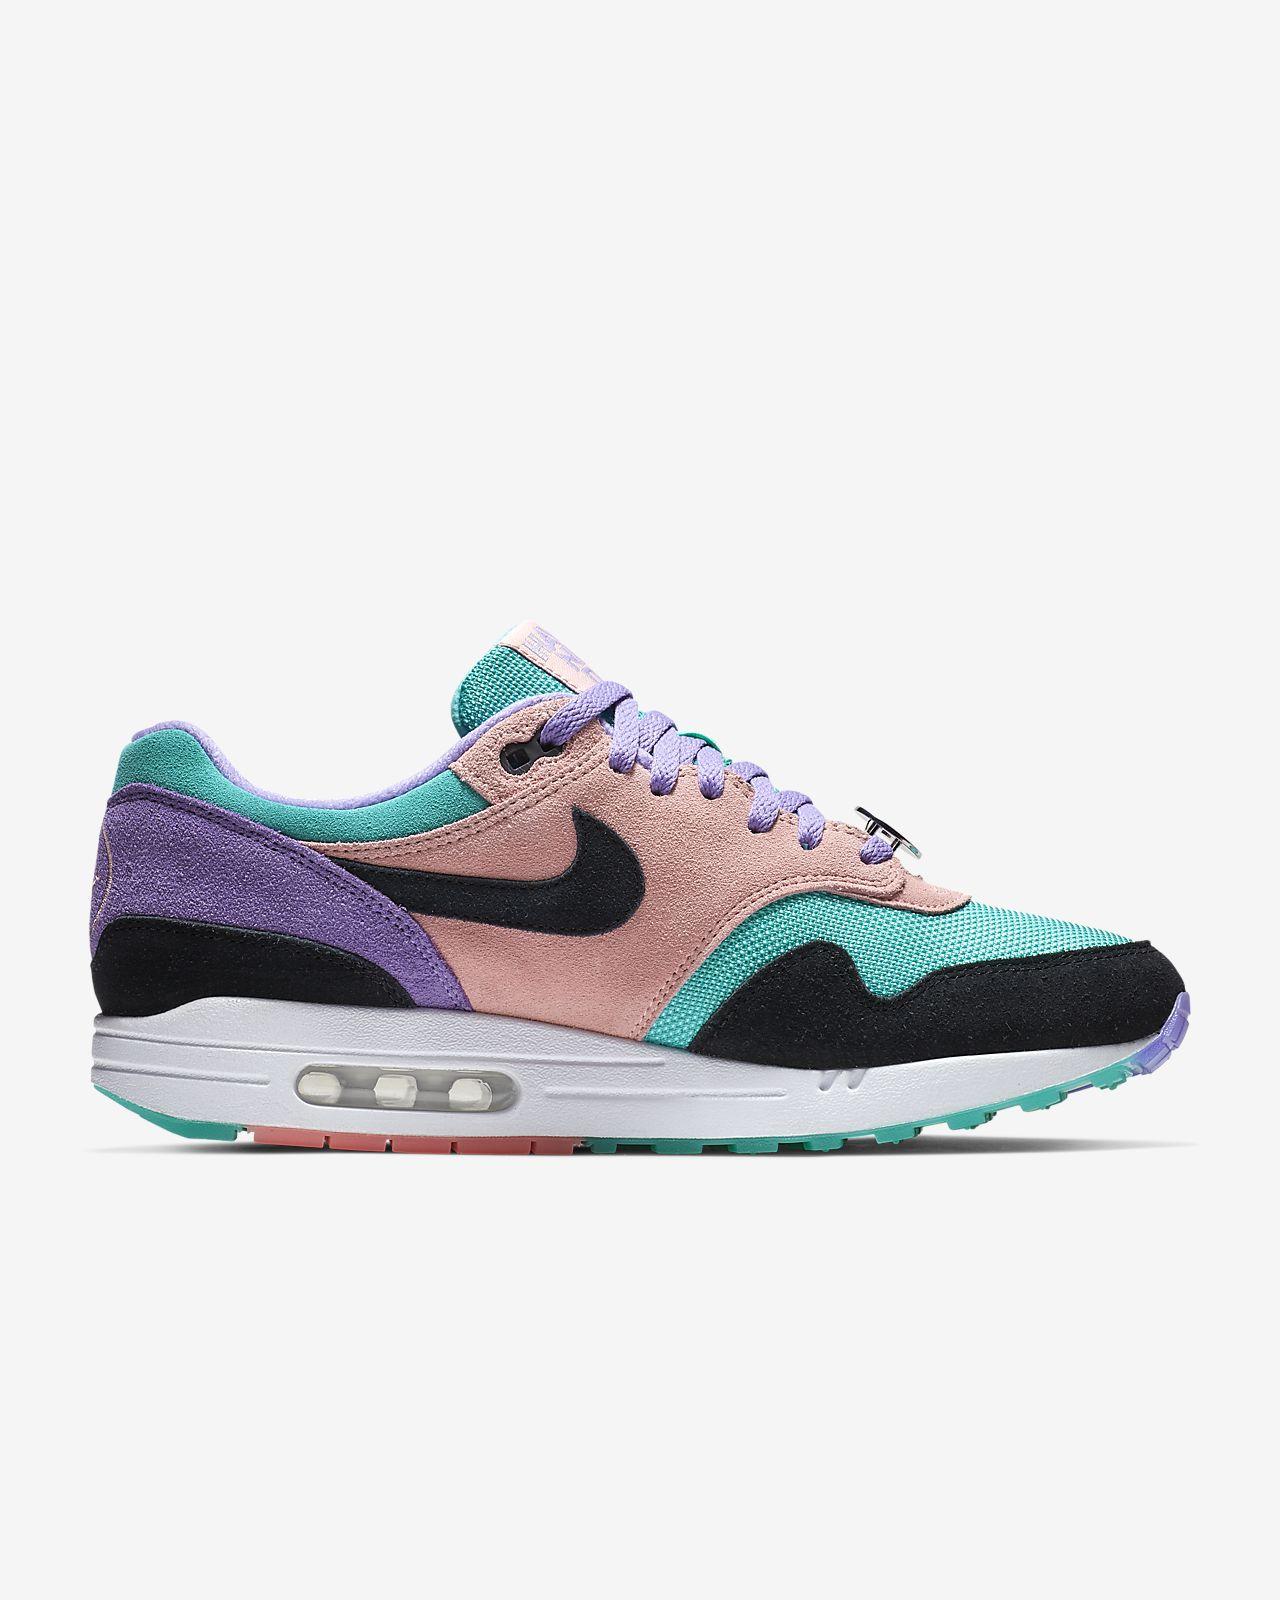 quality design 7d5a3 bc0a5 ... Nike Air Max 1 ND Men s Shoe